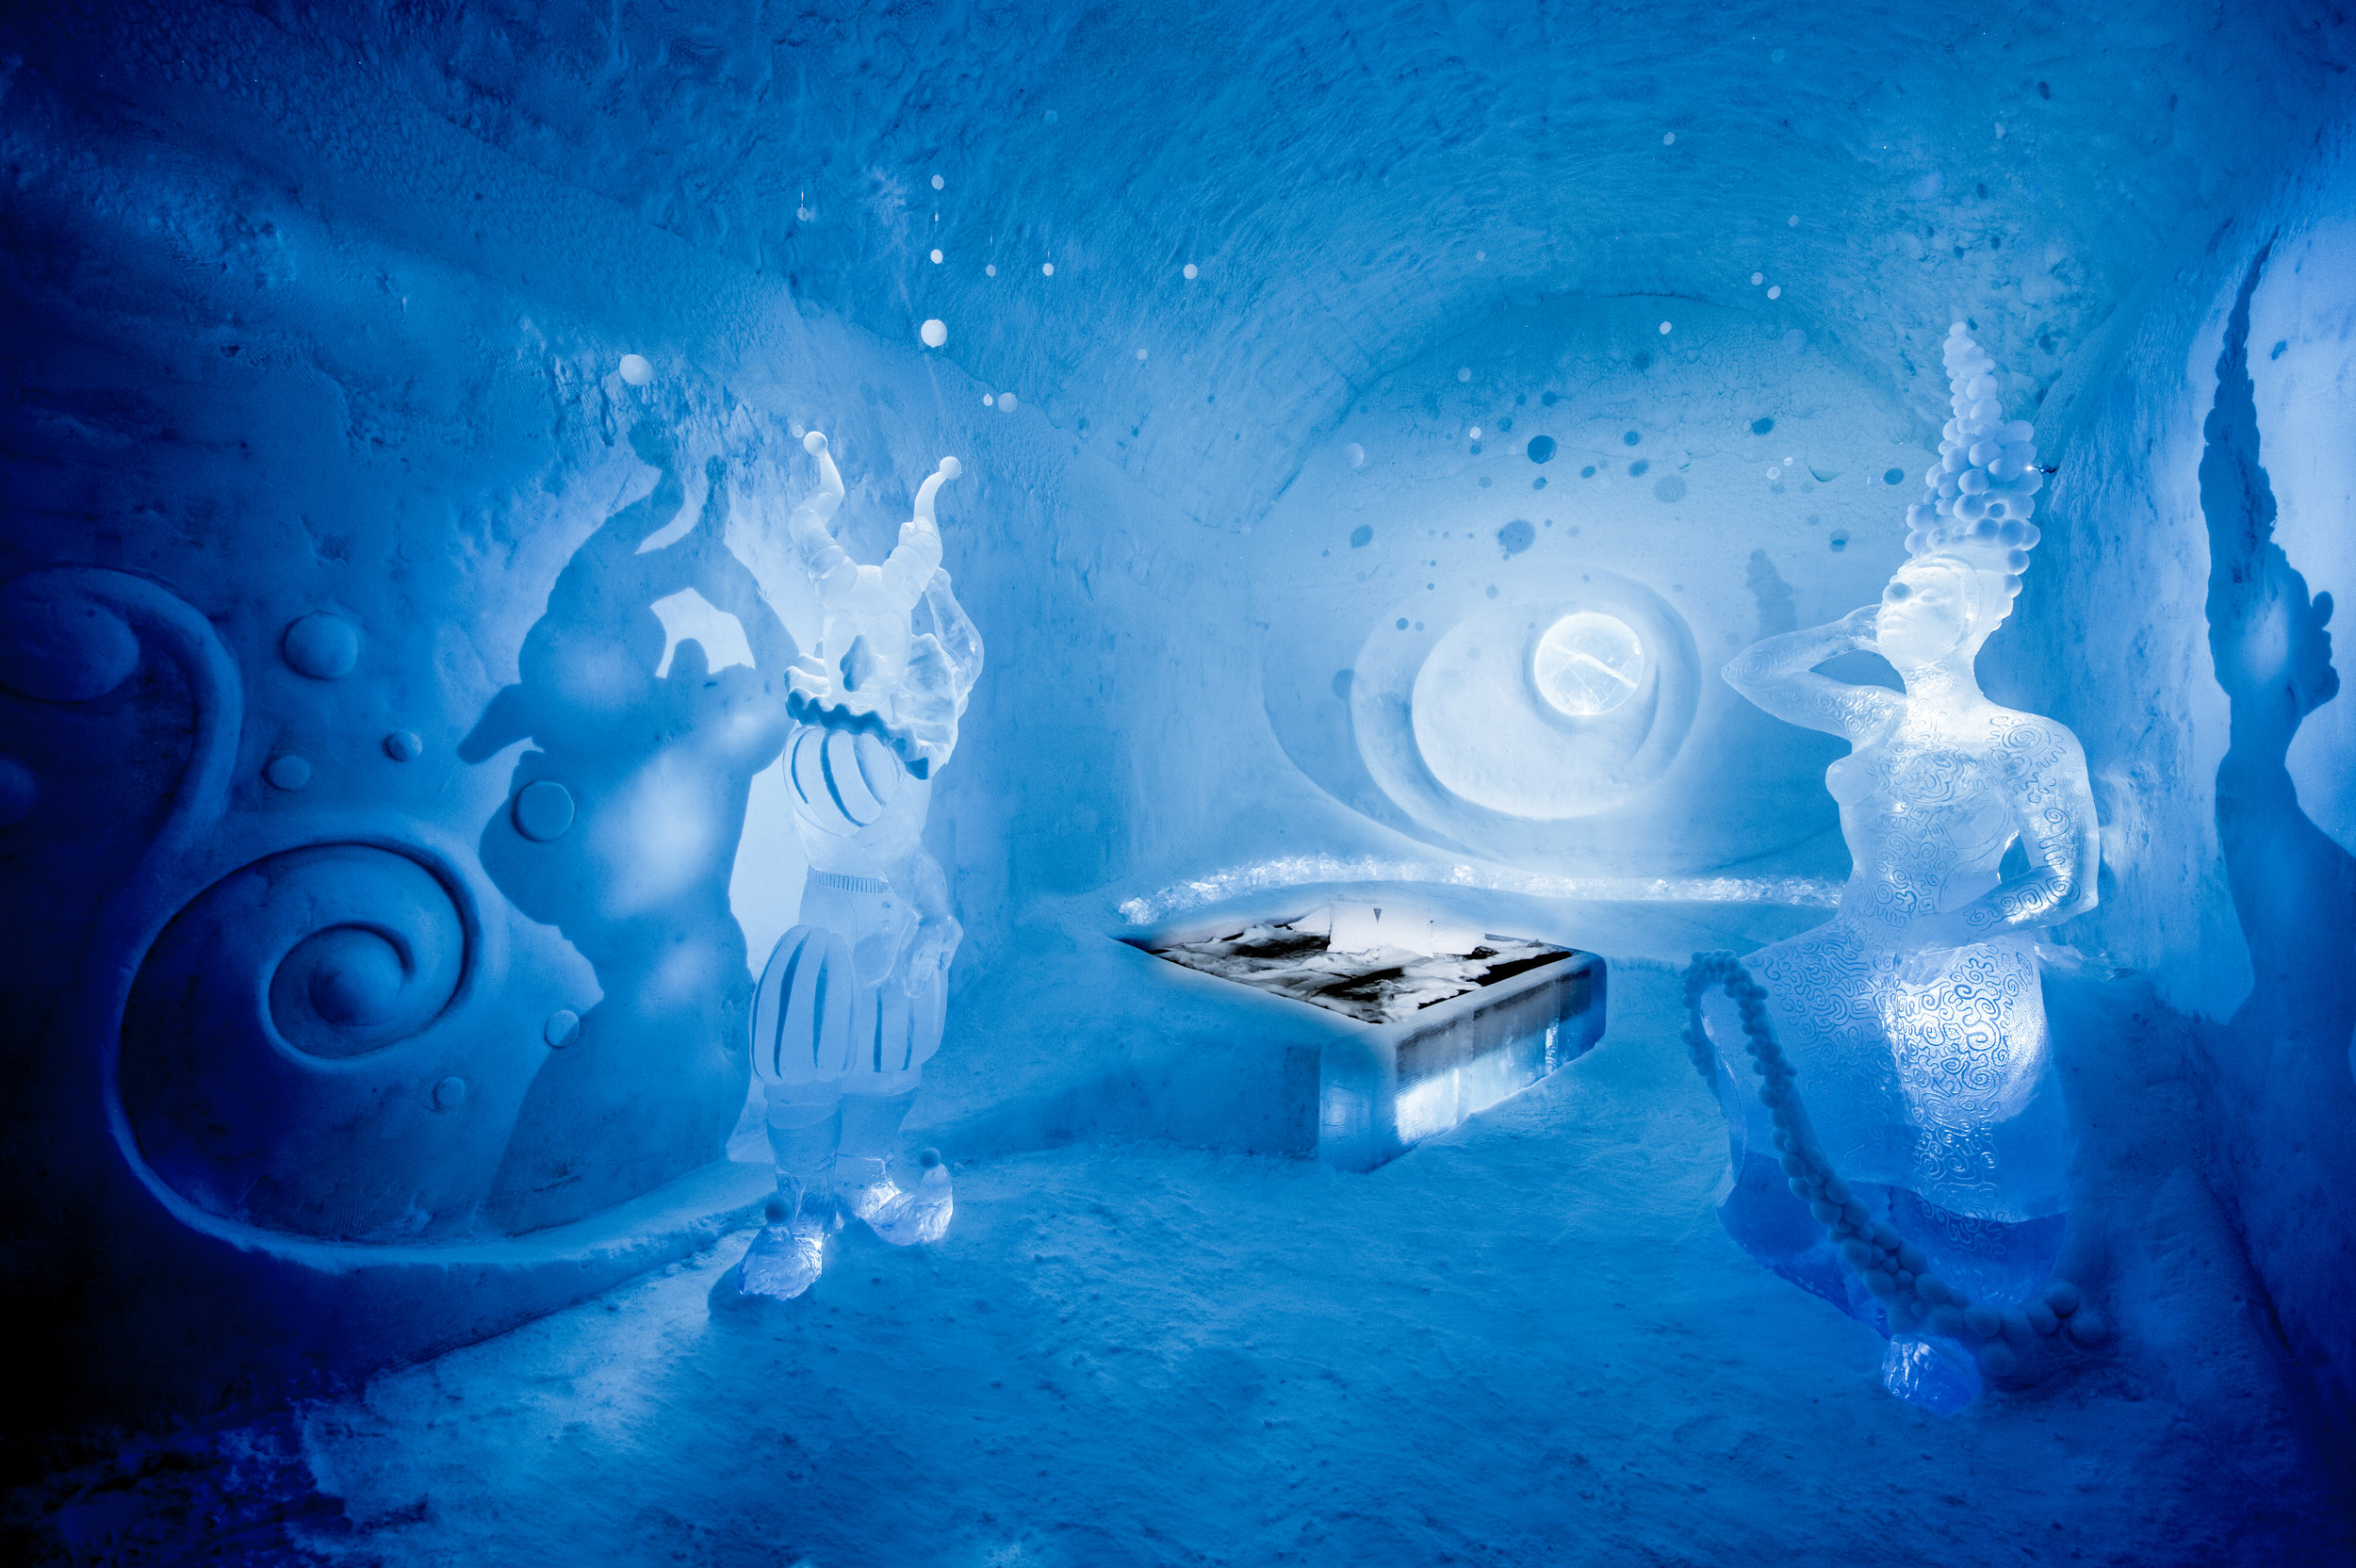 Art suite- Dancers in the dark, artists- Tjåsa Gusfors & Patric Dallard, ICEHOTEL 365. Photo by - Asaf Kliger- (1 of 2) (1 of 2).jpg